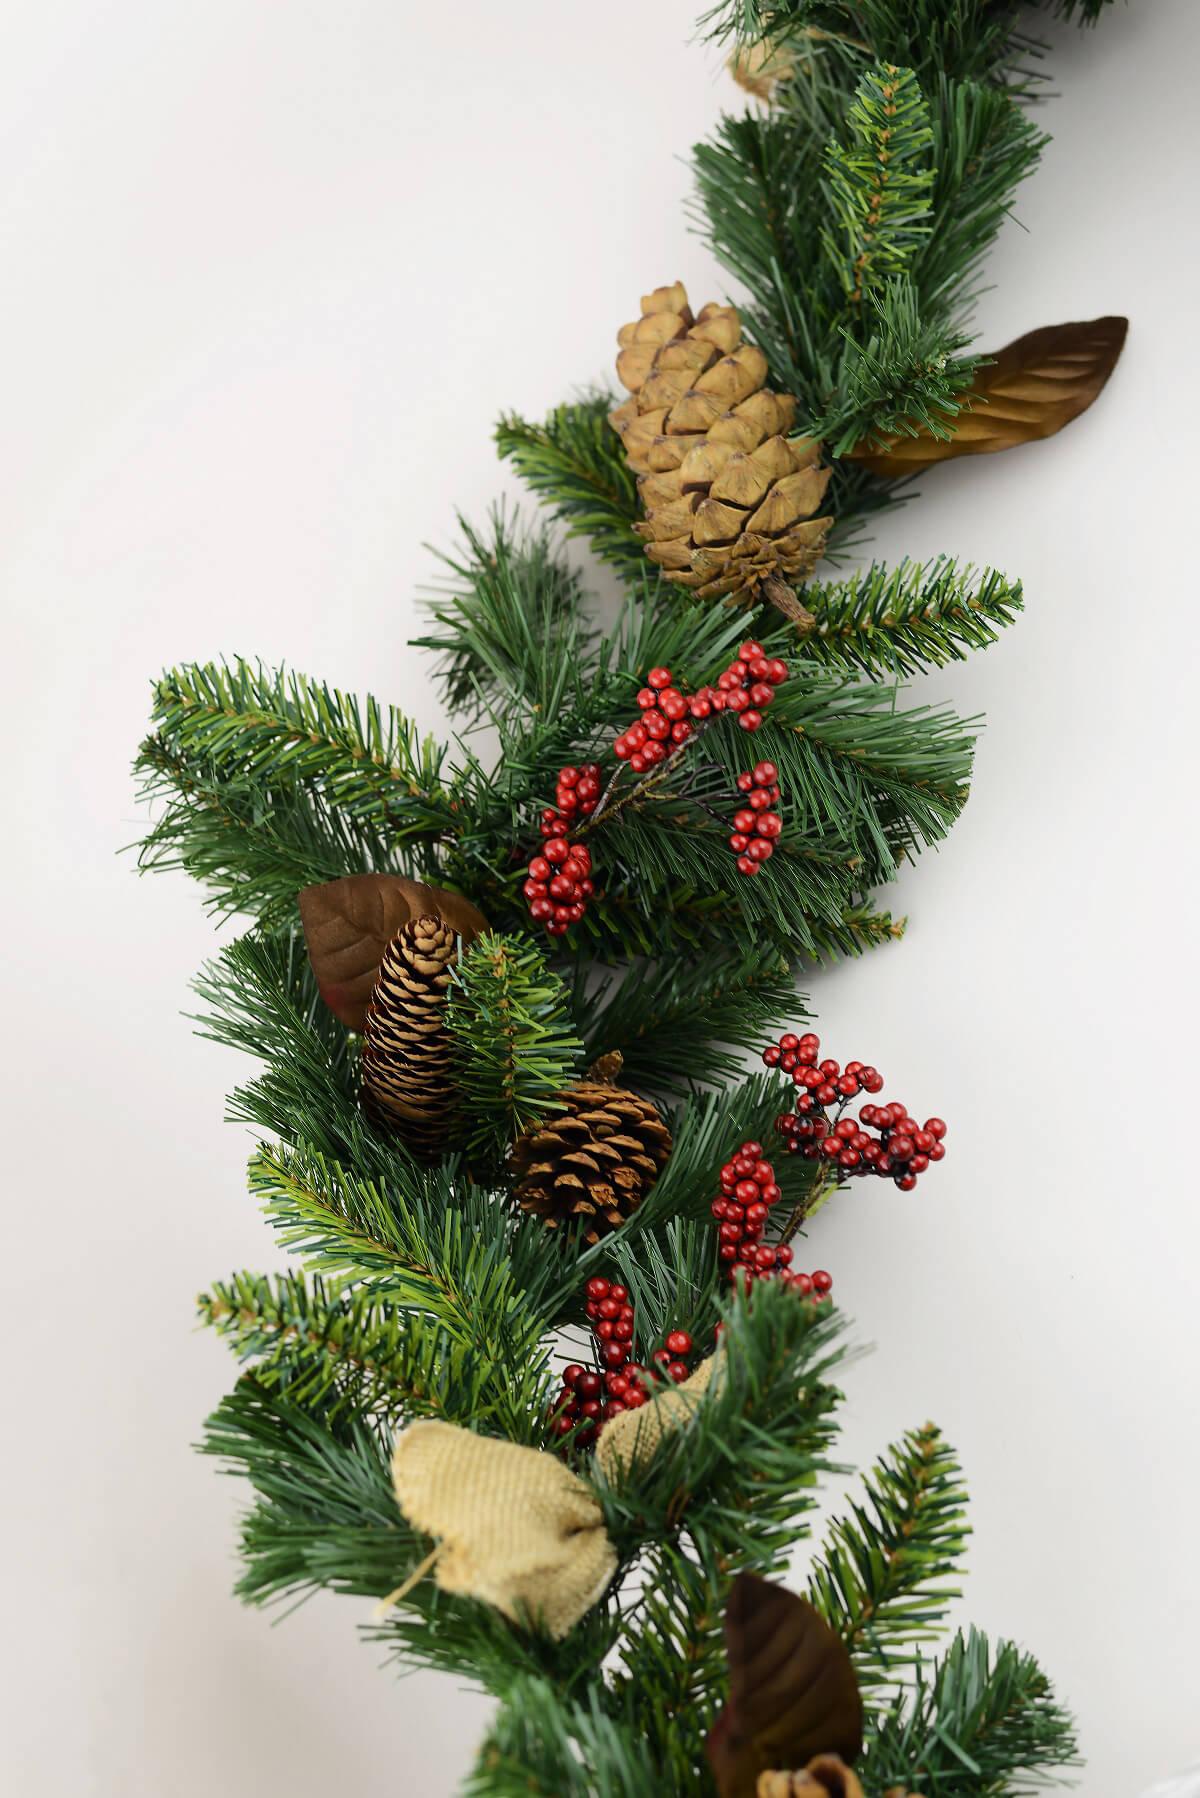 michaels christmas garland pine cones - Michaels Christmas Garland